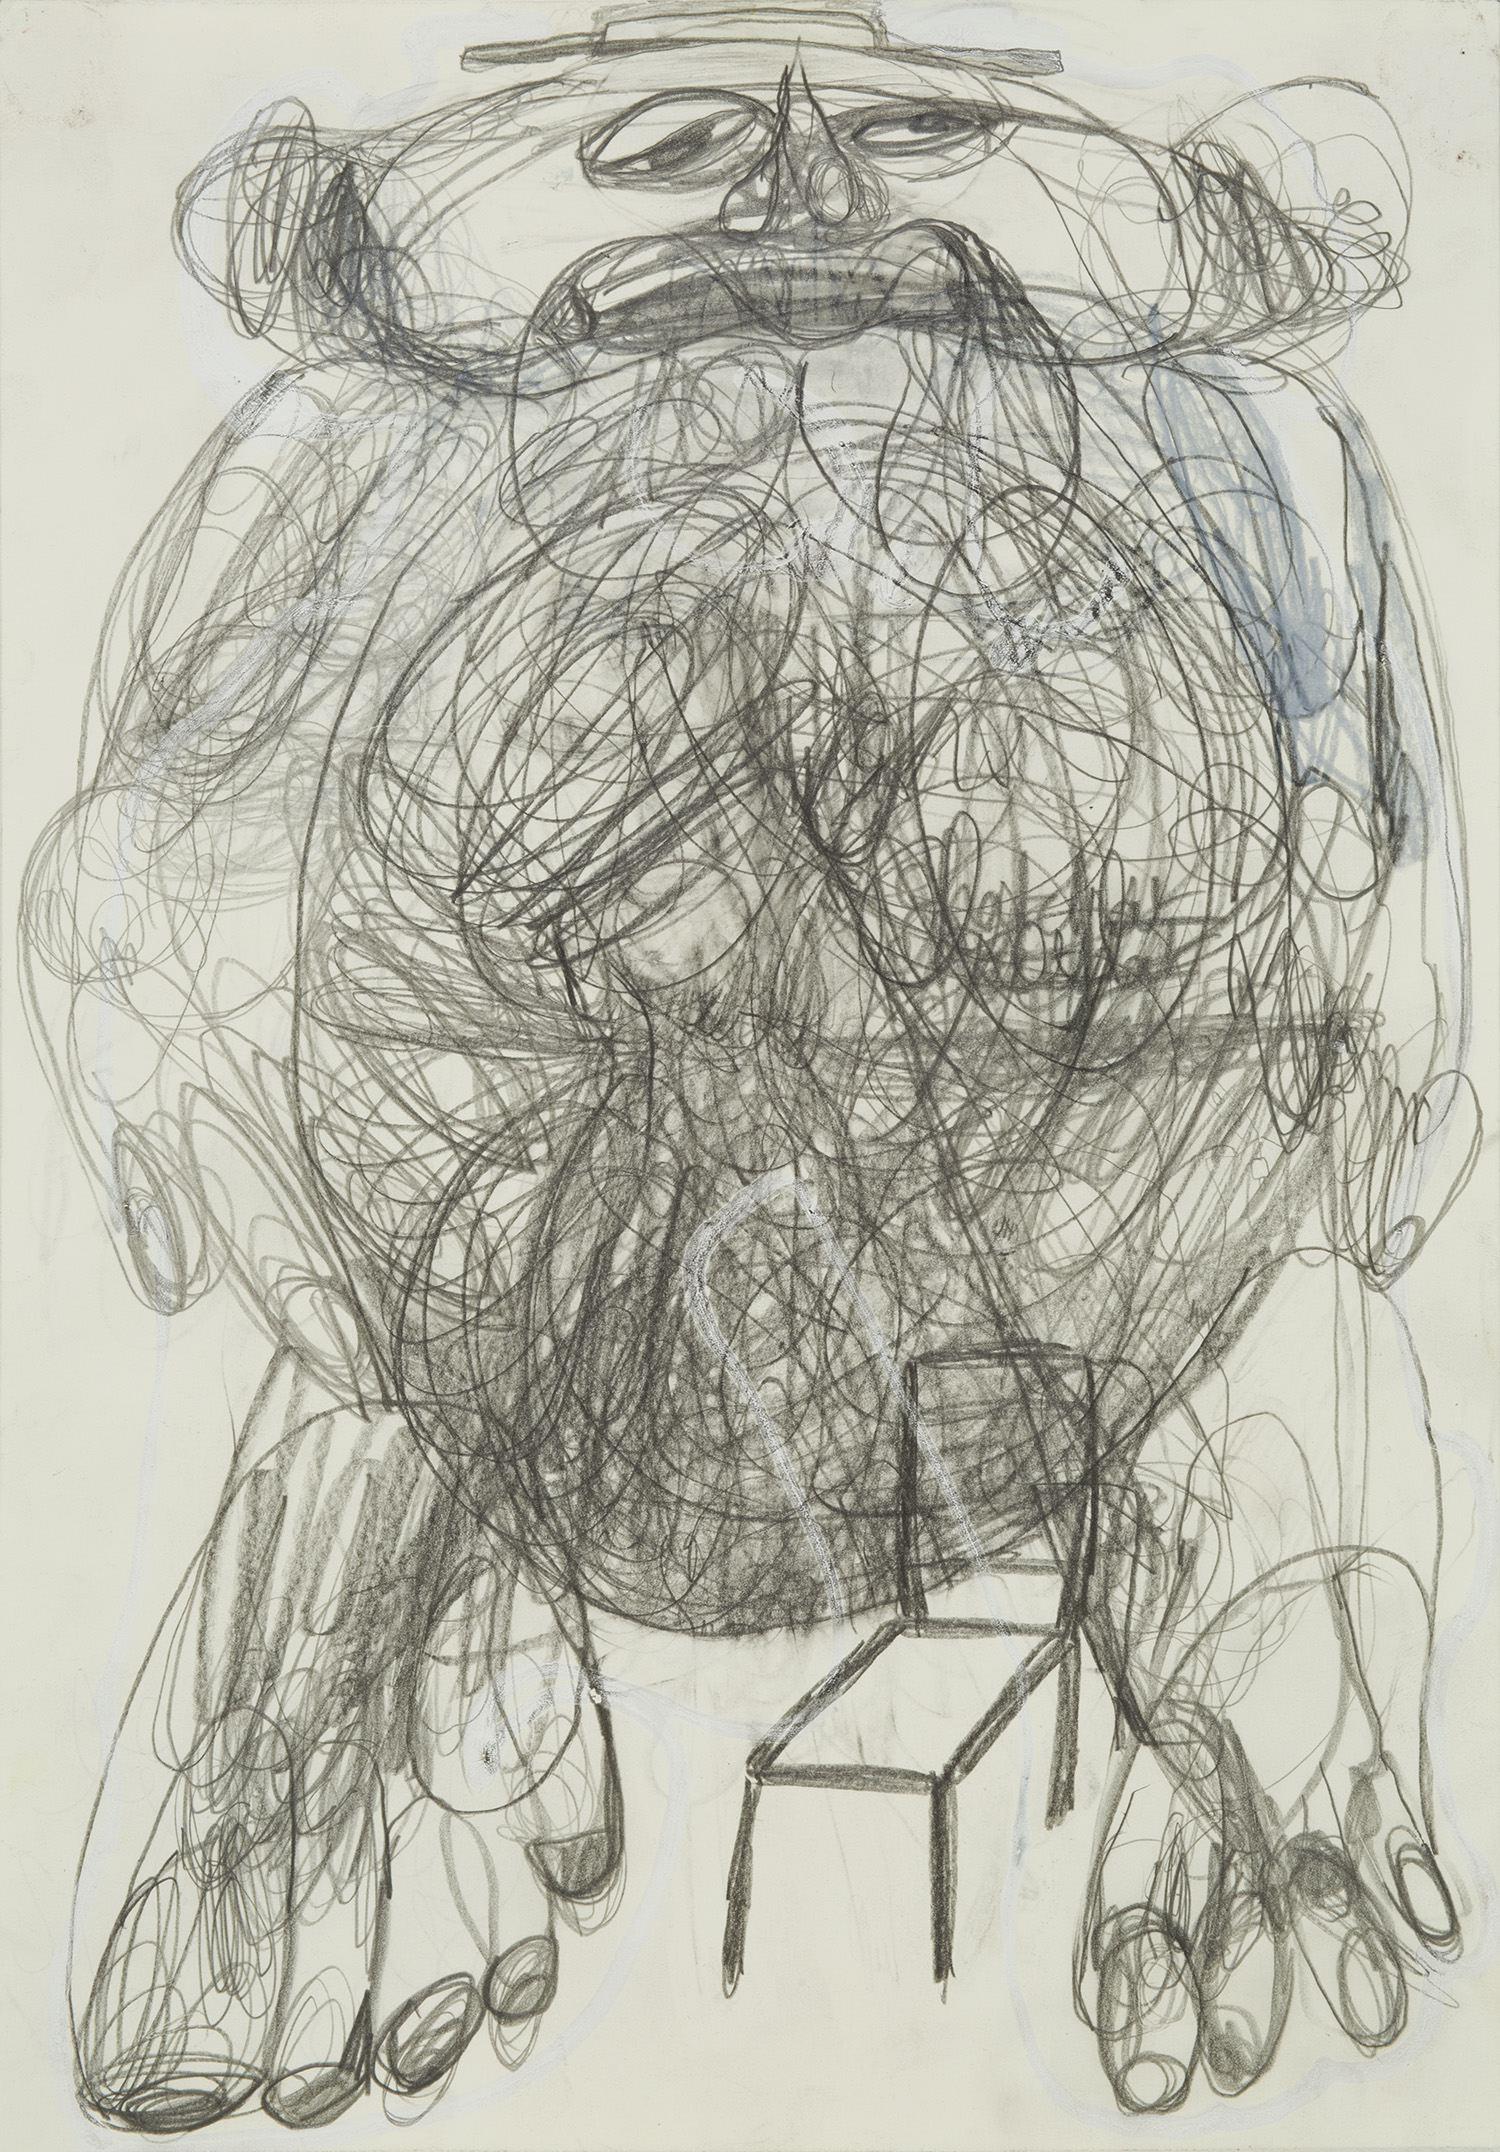 Caroline Demangel    Untitled  , 2014 Mixed media on paper 11.75 x 8.25 inches 29.8 x 21 cm CDm 6